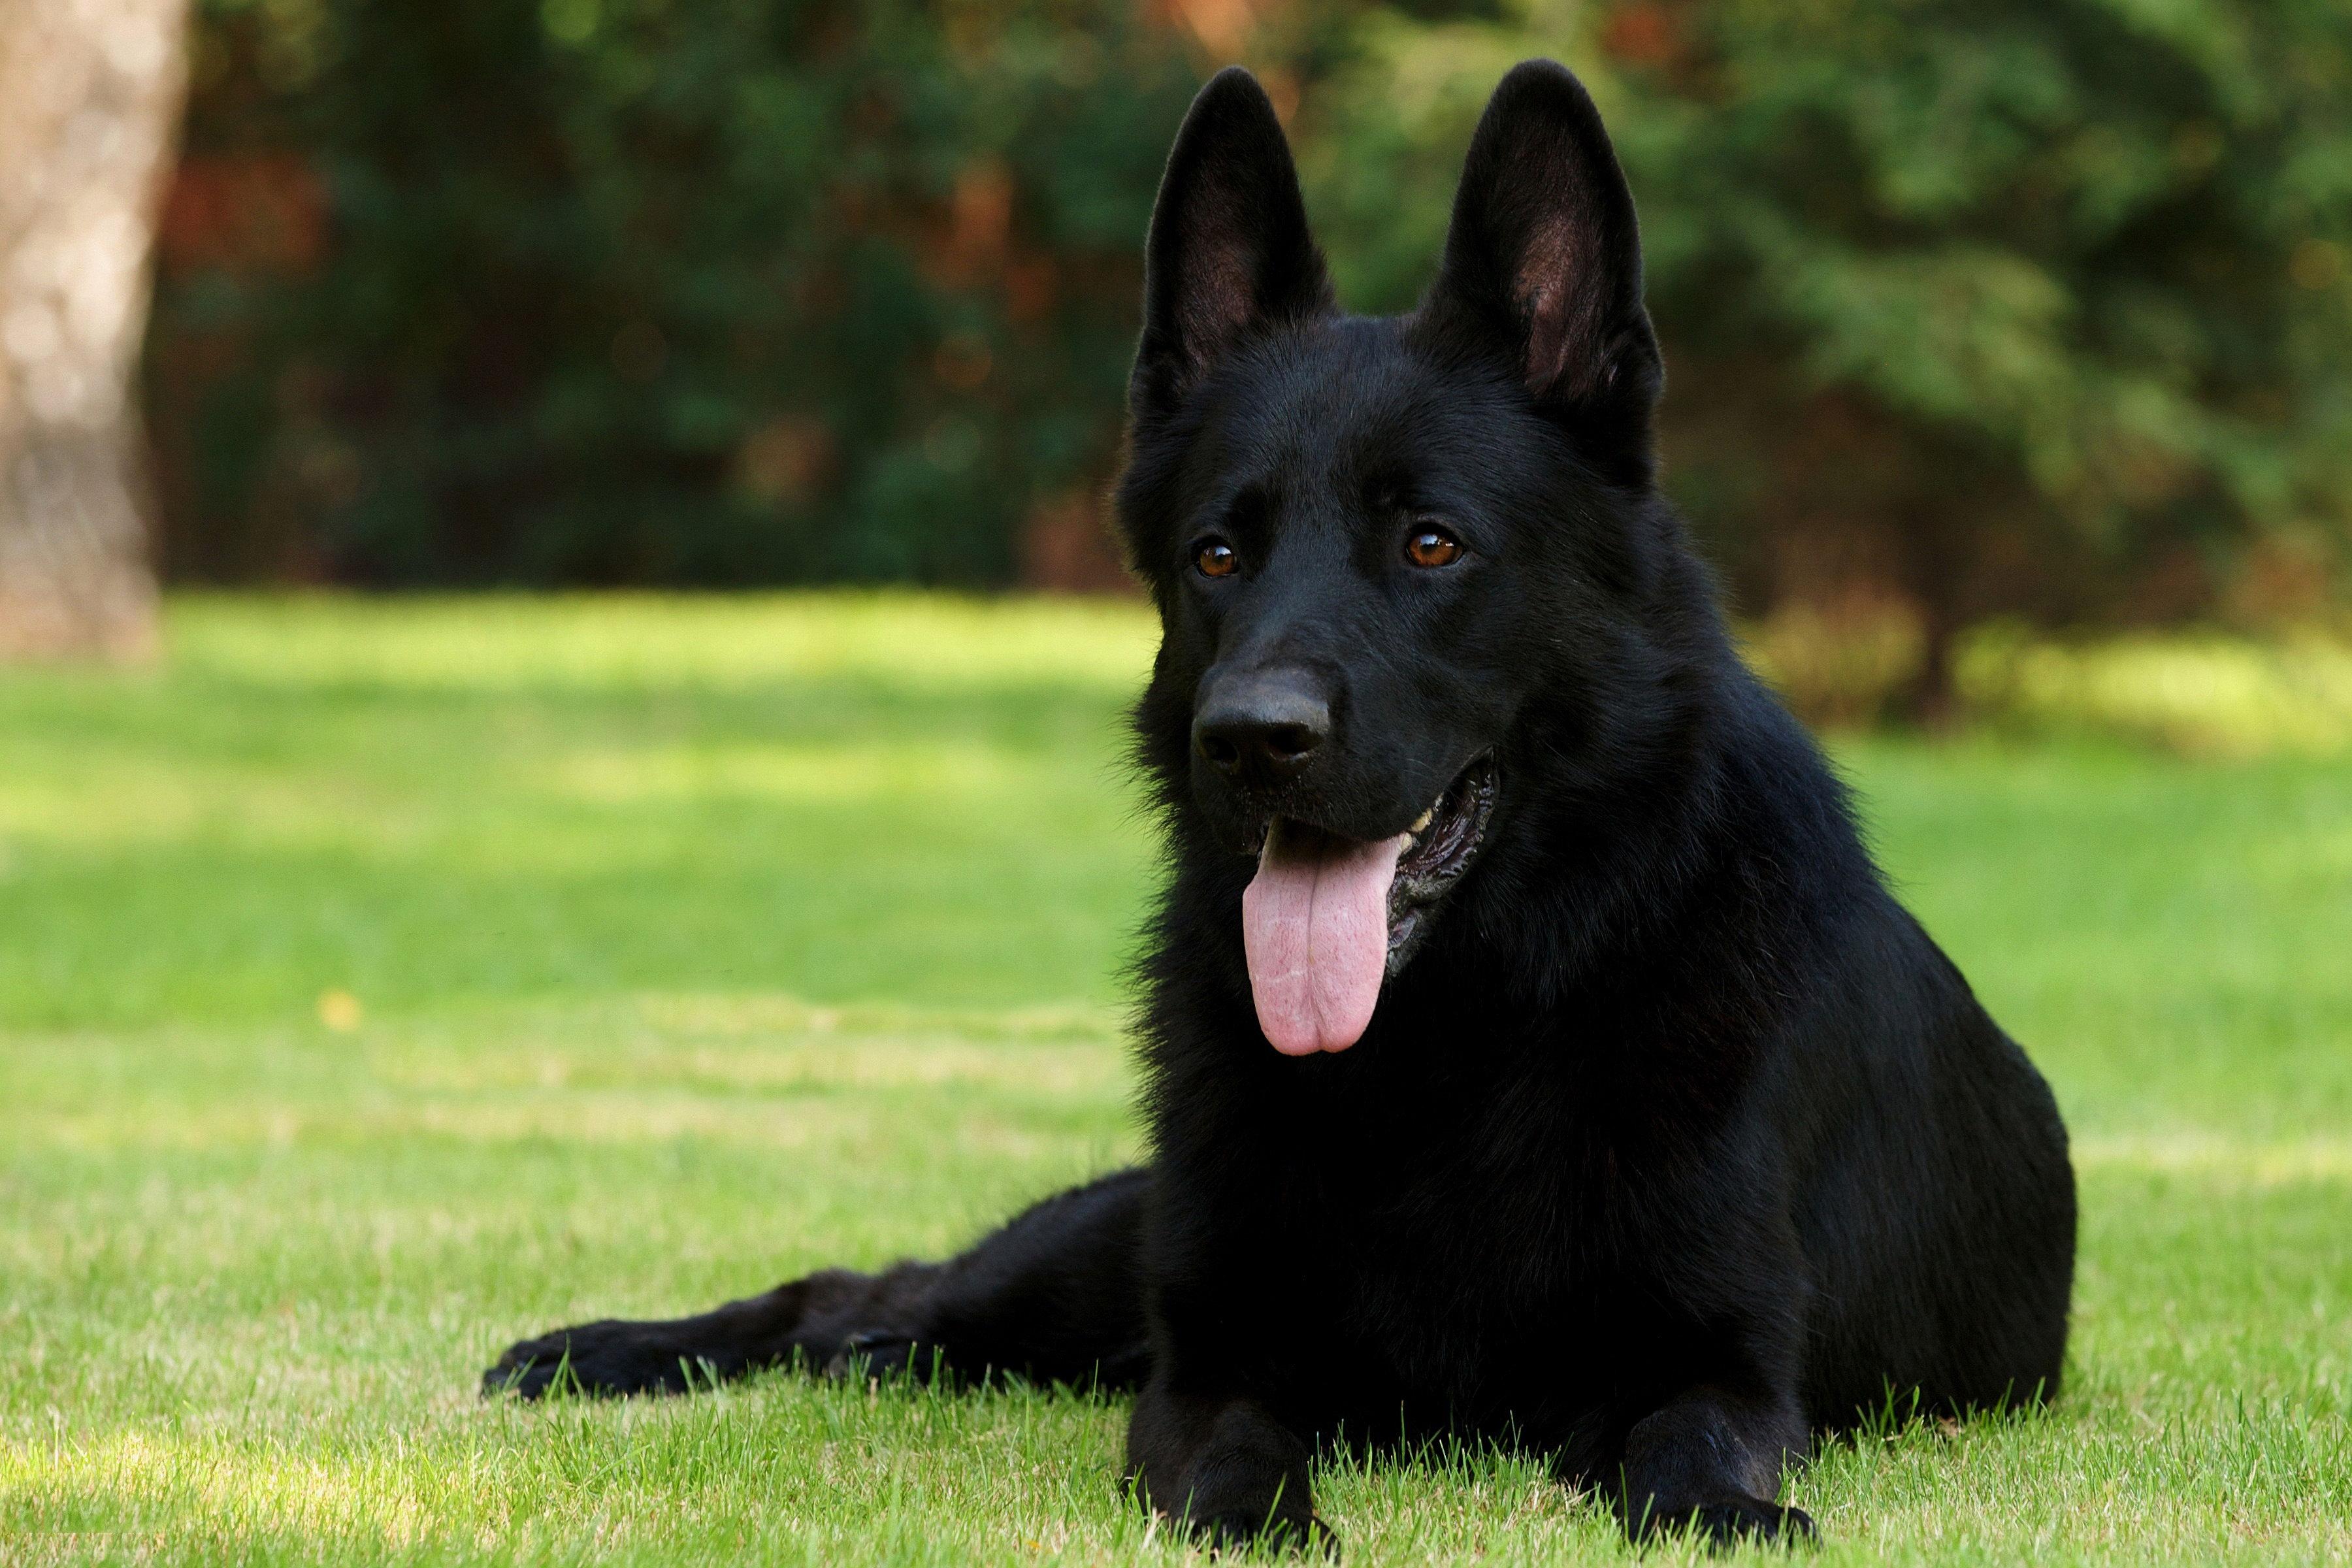 146890 download wallpaper Animals, Grass, Sit, Dog, German Shepherd, Exclusive, Black Shepherd, Black Sheepdog screensavers and pictures for free